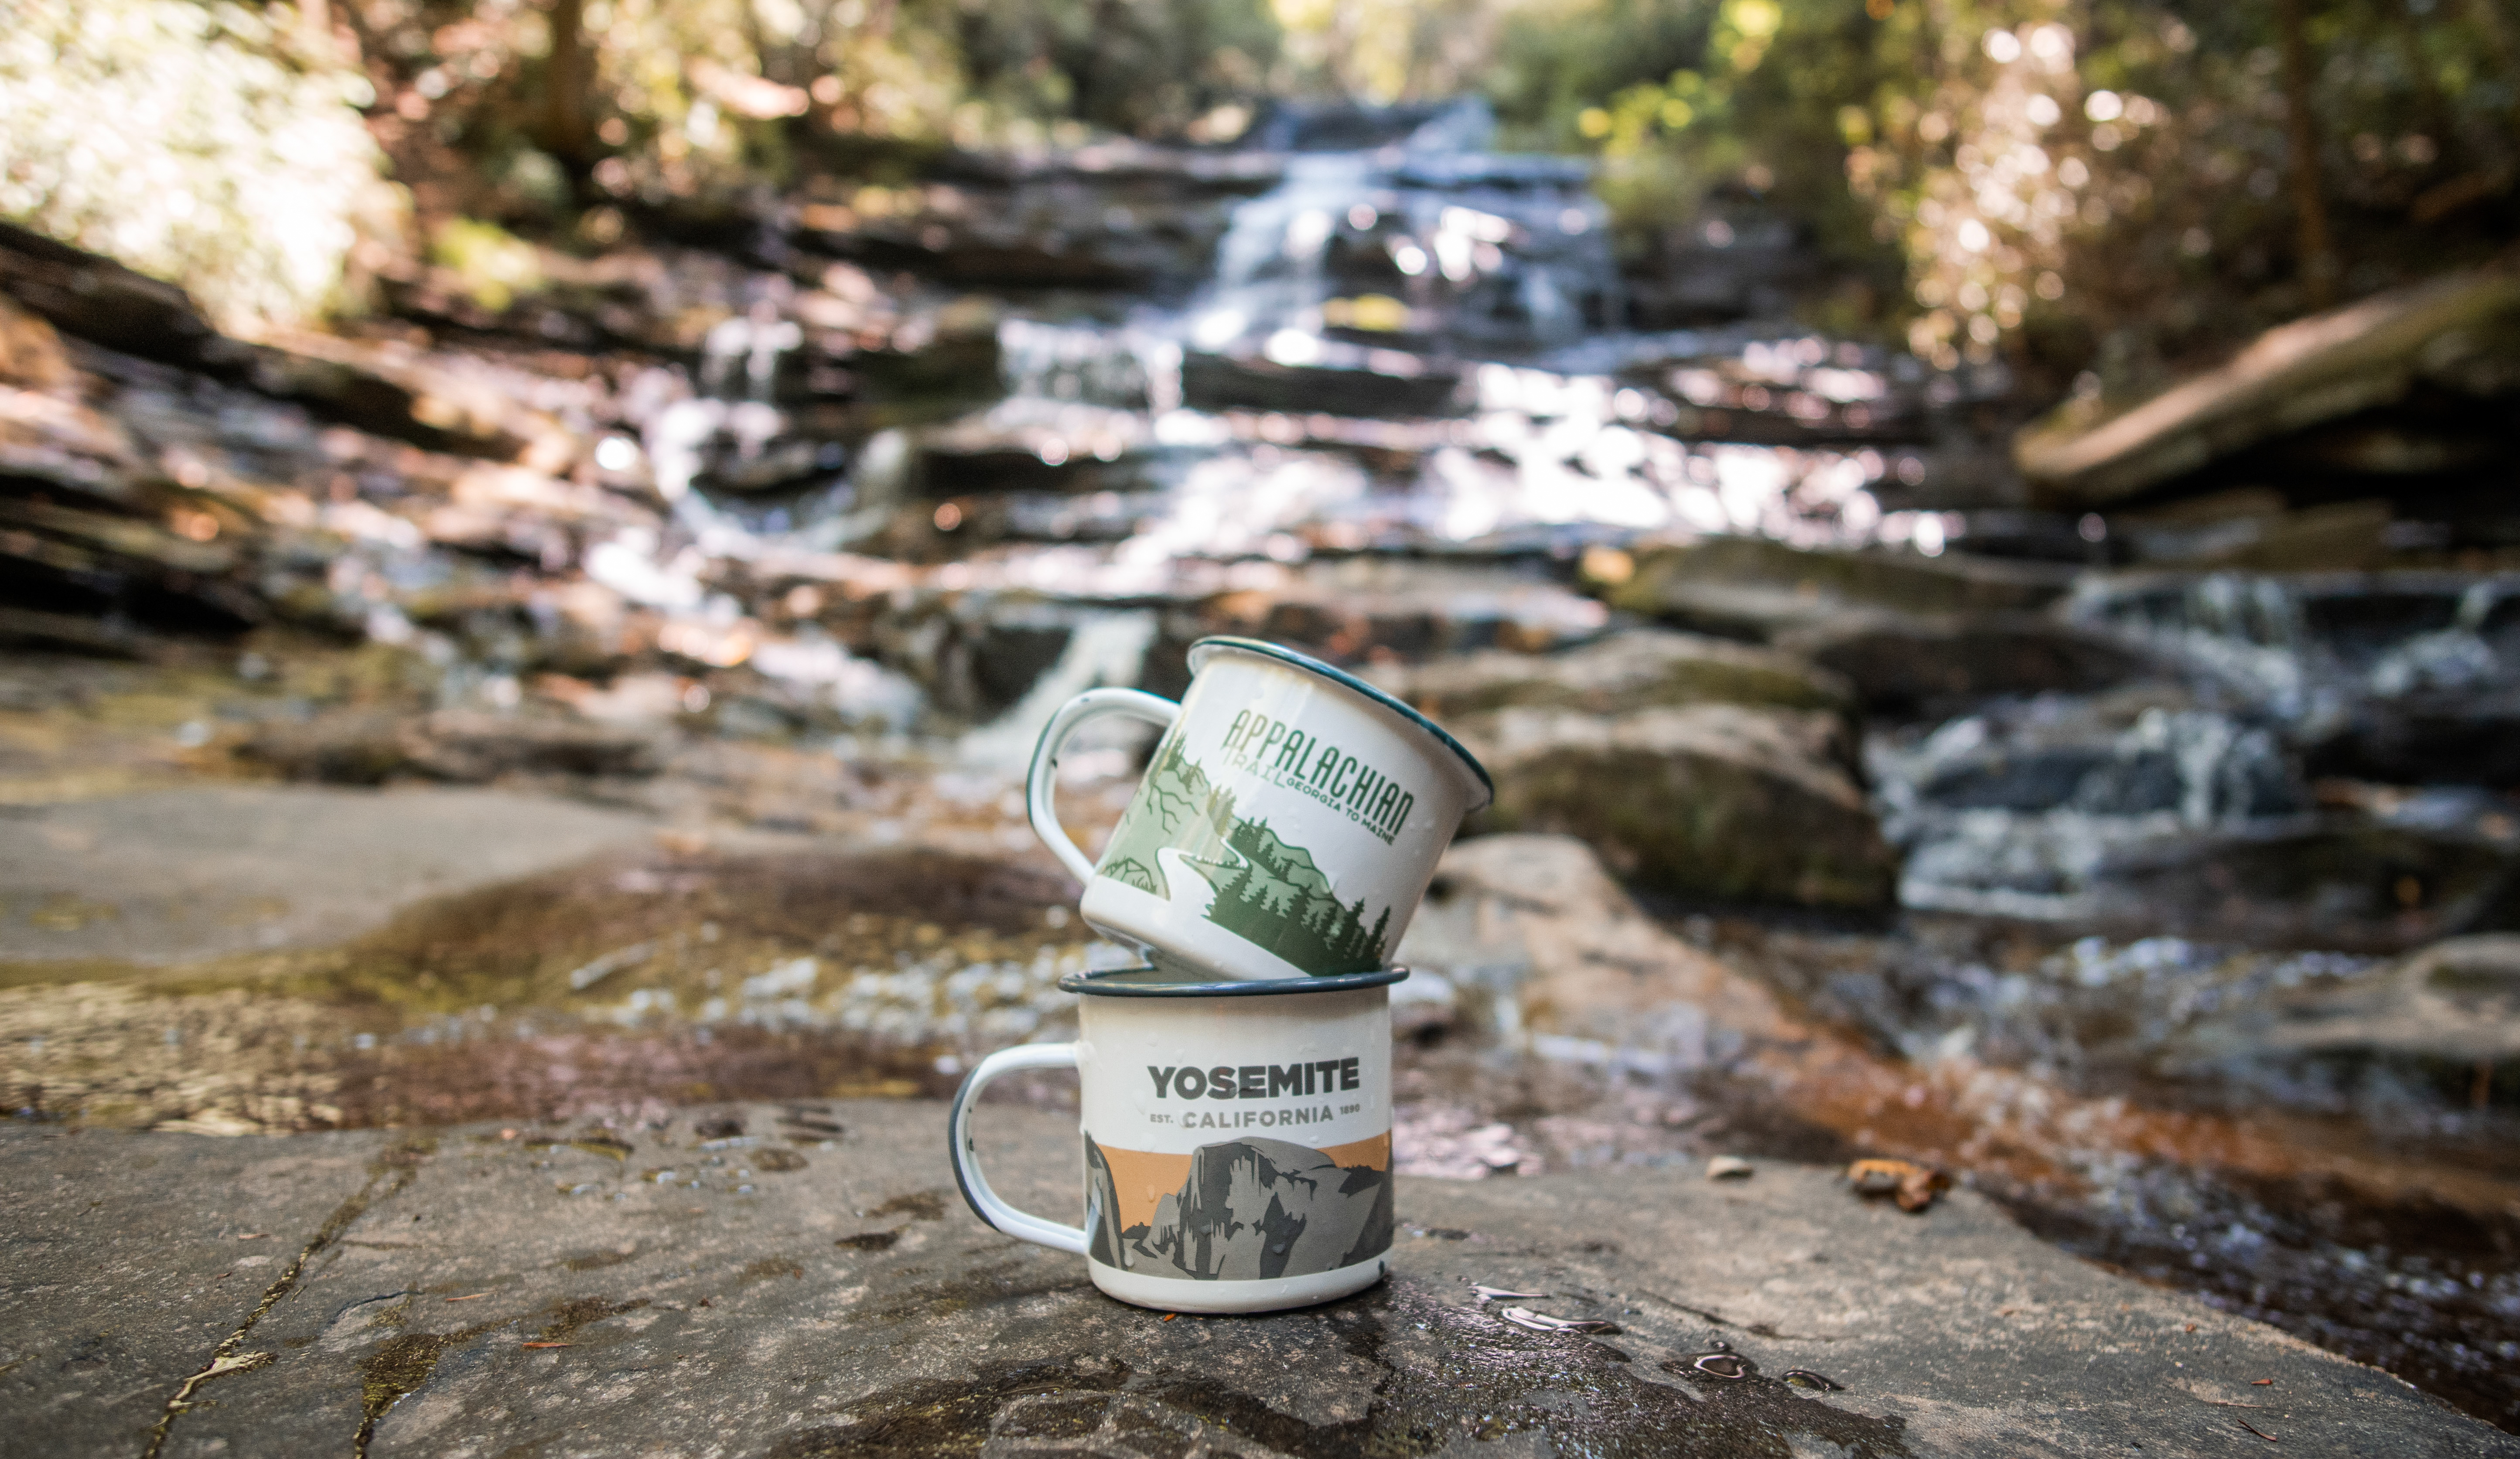 Yosemite Enamel Mug